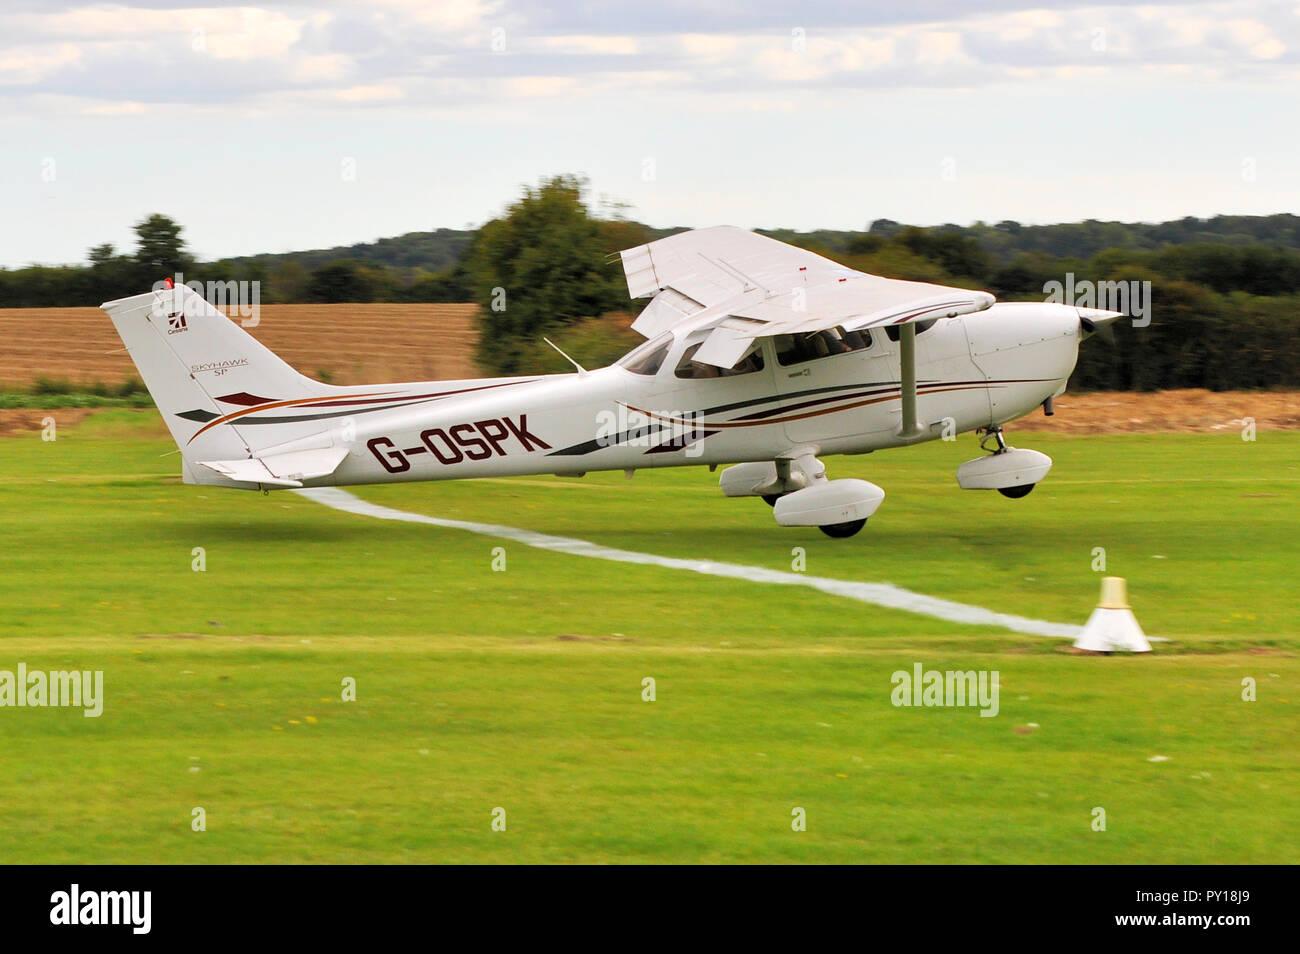 Cessna 172 Skyhawk G-OSPK of Russell Denny in a spot landing competition at  Elmsett